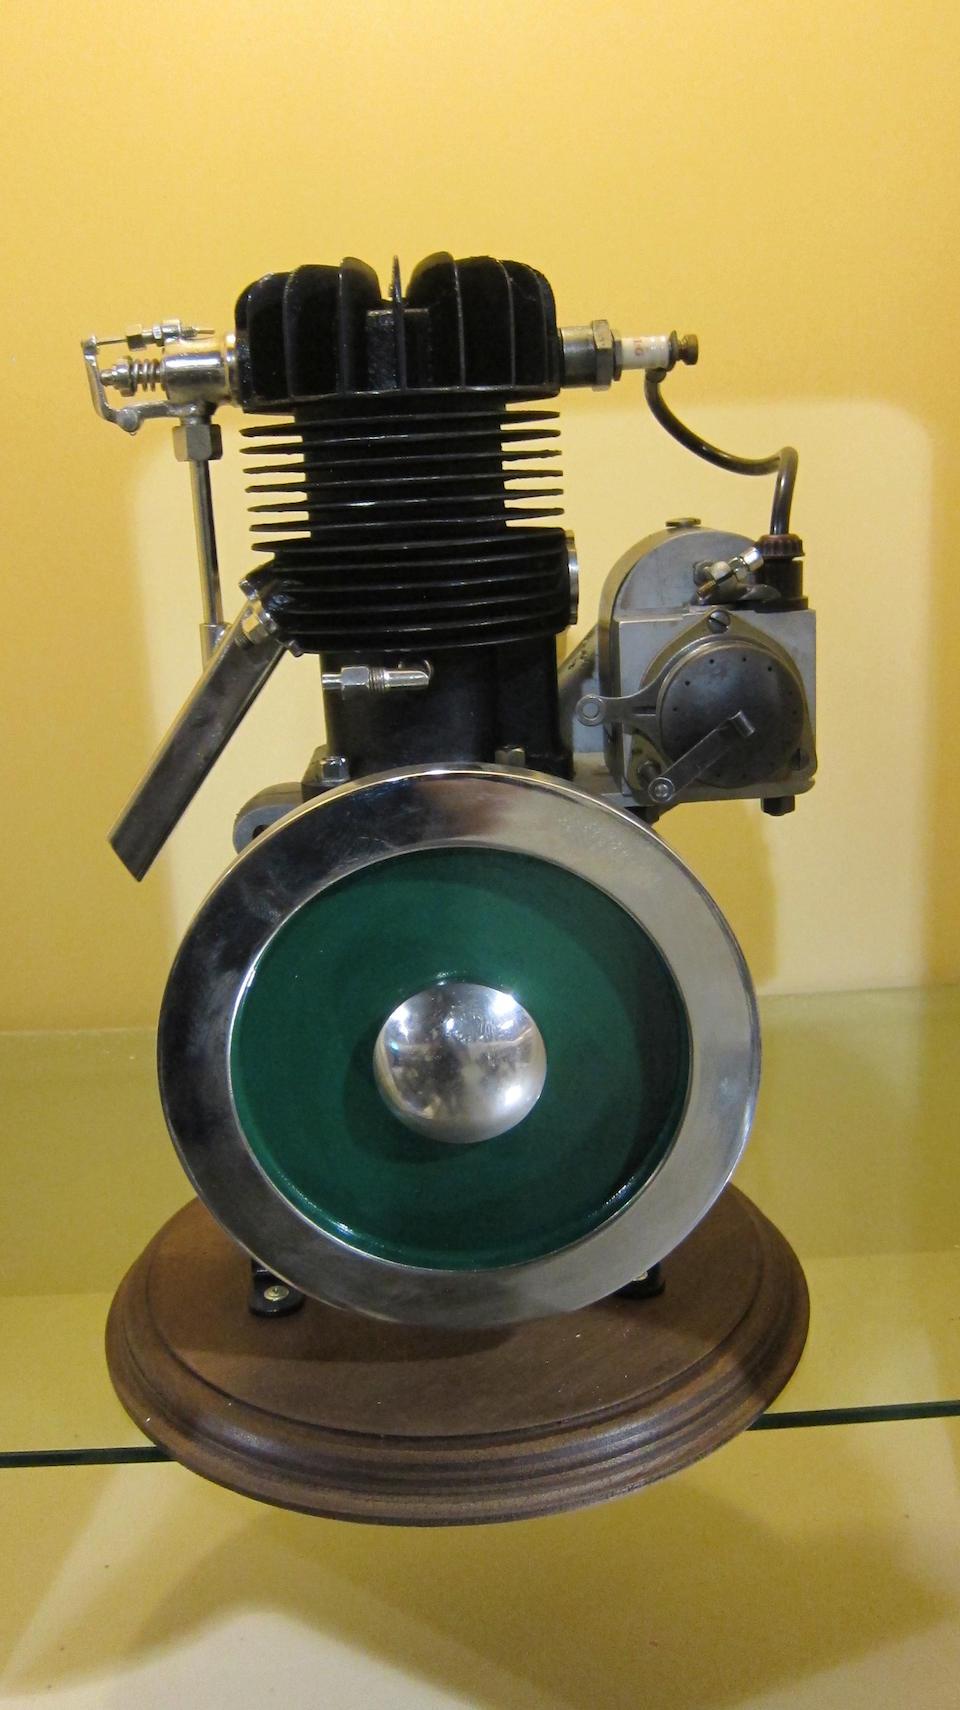 A Molaroni Two-stroke engine